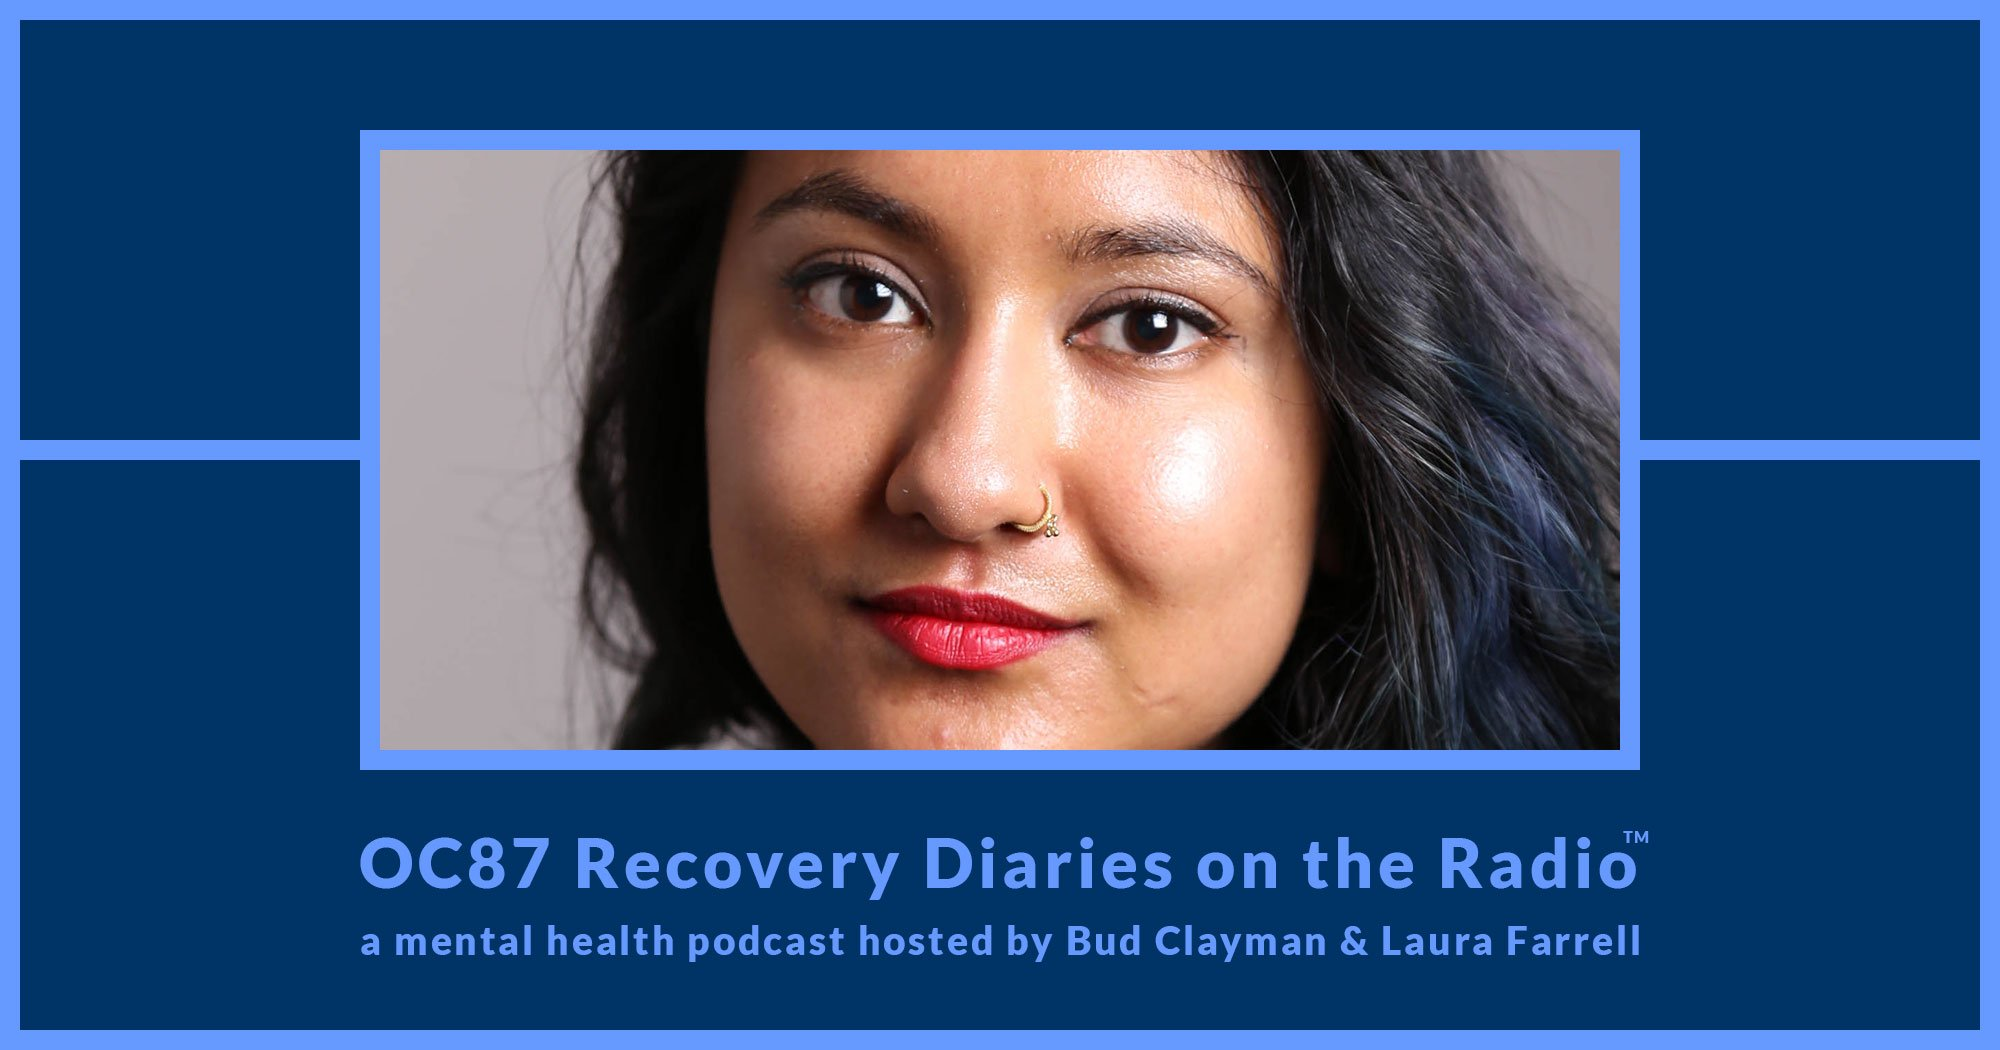 Episode 8 - A Bengali American Woman's Bipolar Journey - OC87